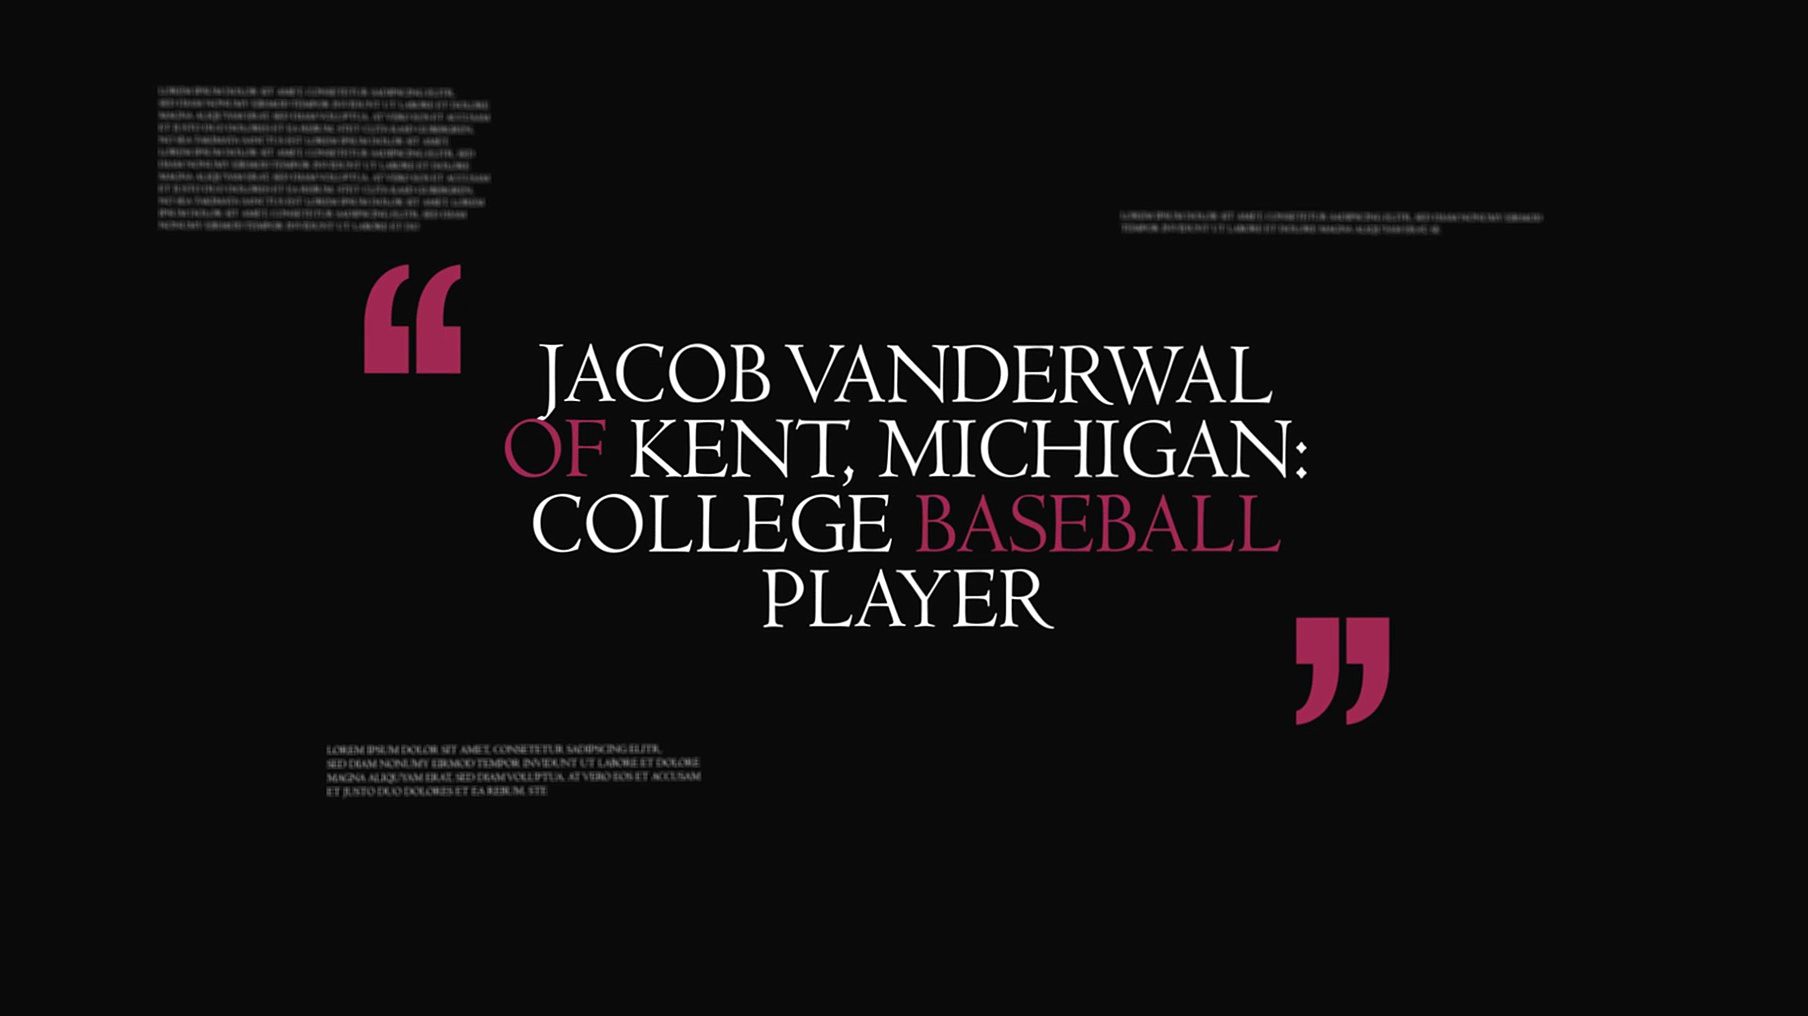 Jacob Vanderwal of Kent, Michigan: College Baseball Player